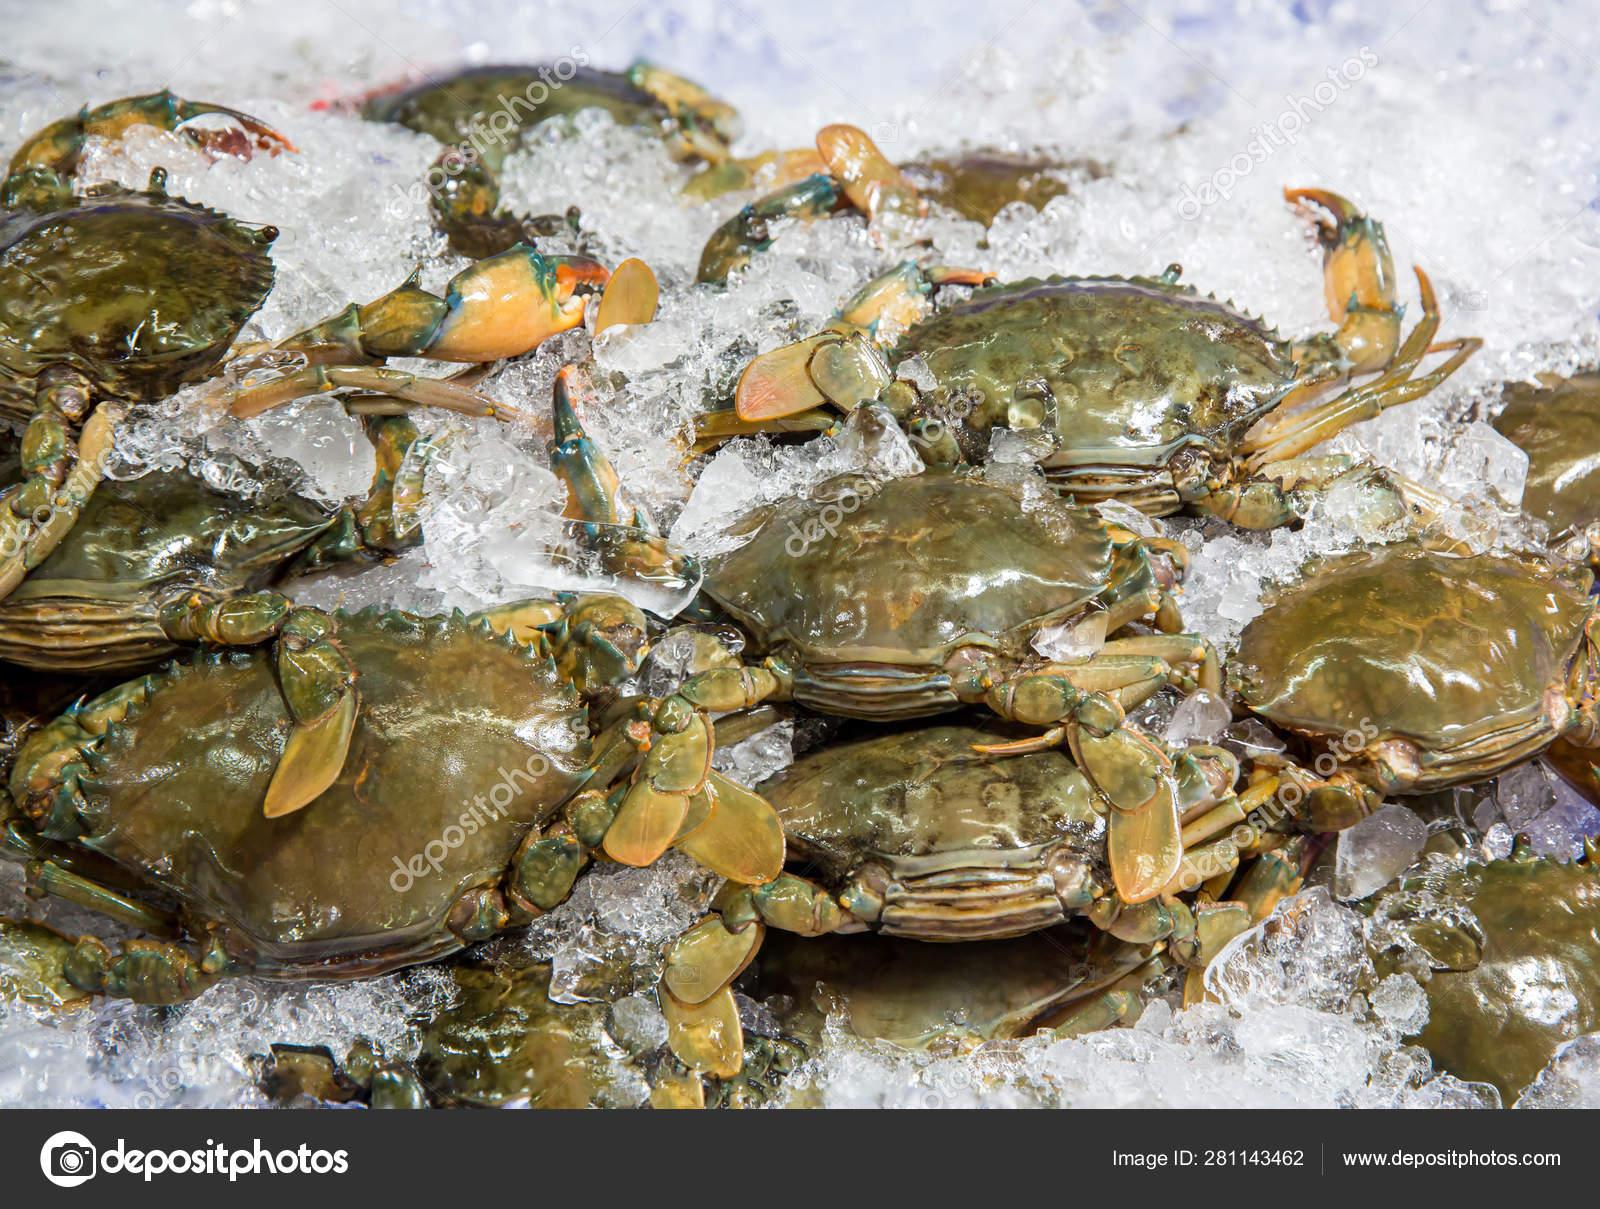 Fresh Crabs Seafood Market Arthropod Phylum Armature Claw Concept